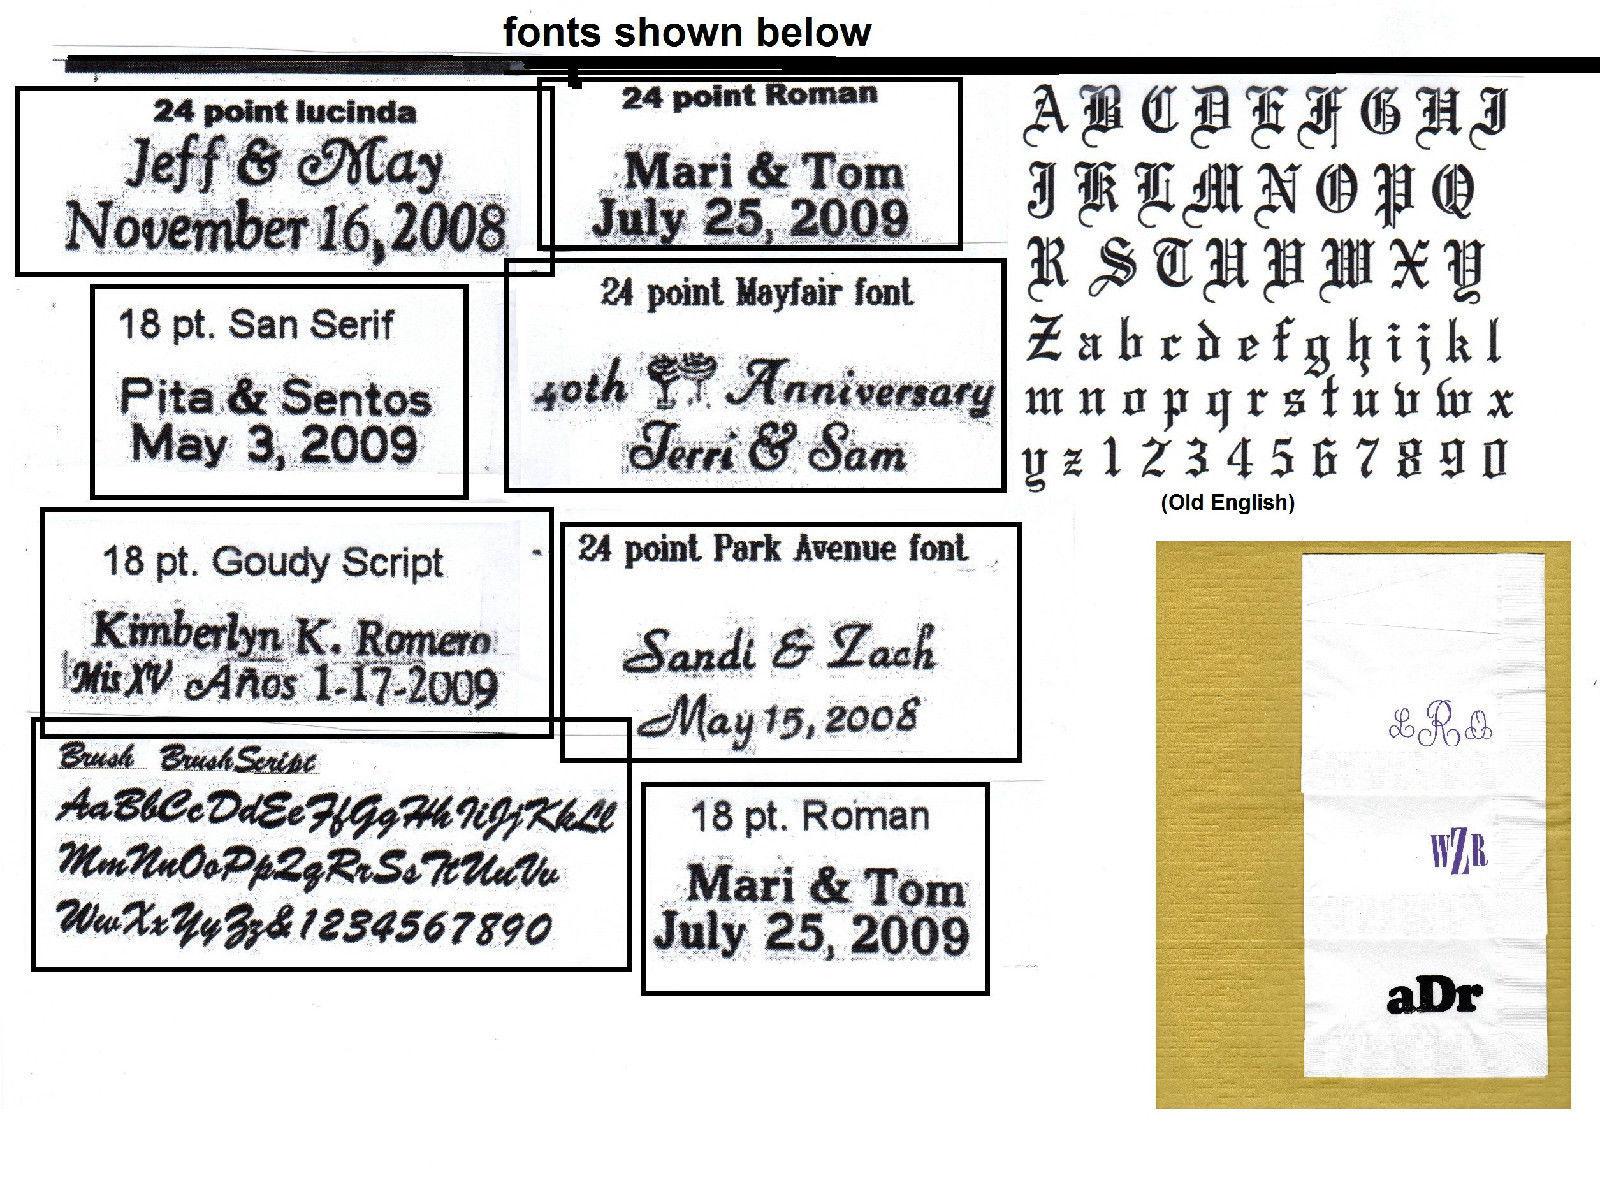 ROYAL FLUSH CARDS LOGO 50 Personalized printed DINNER HAND TOWEL FOLD napkins image 4